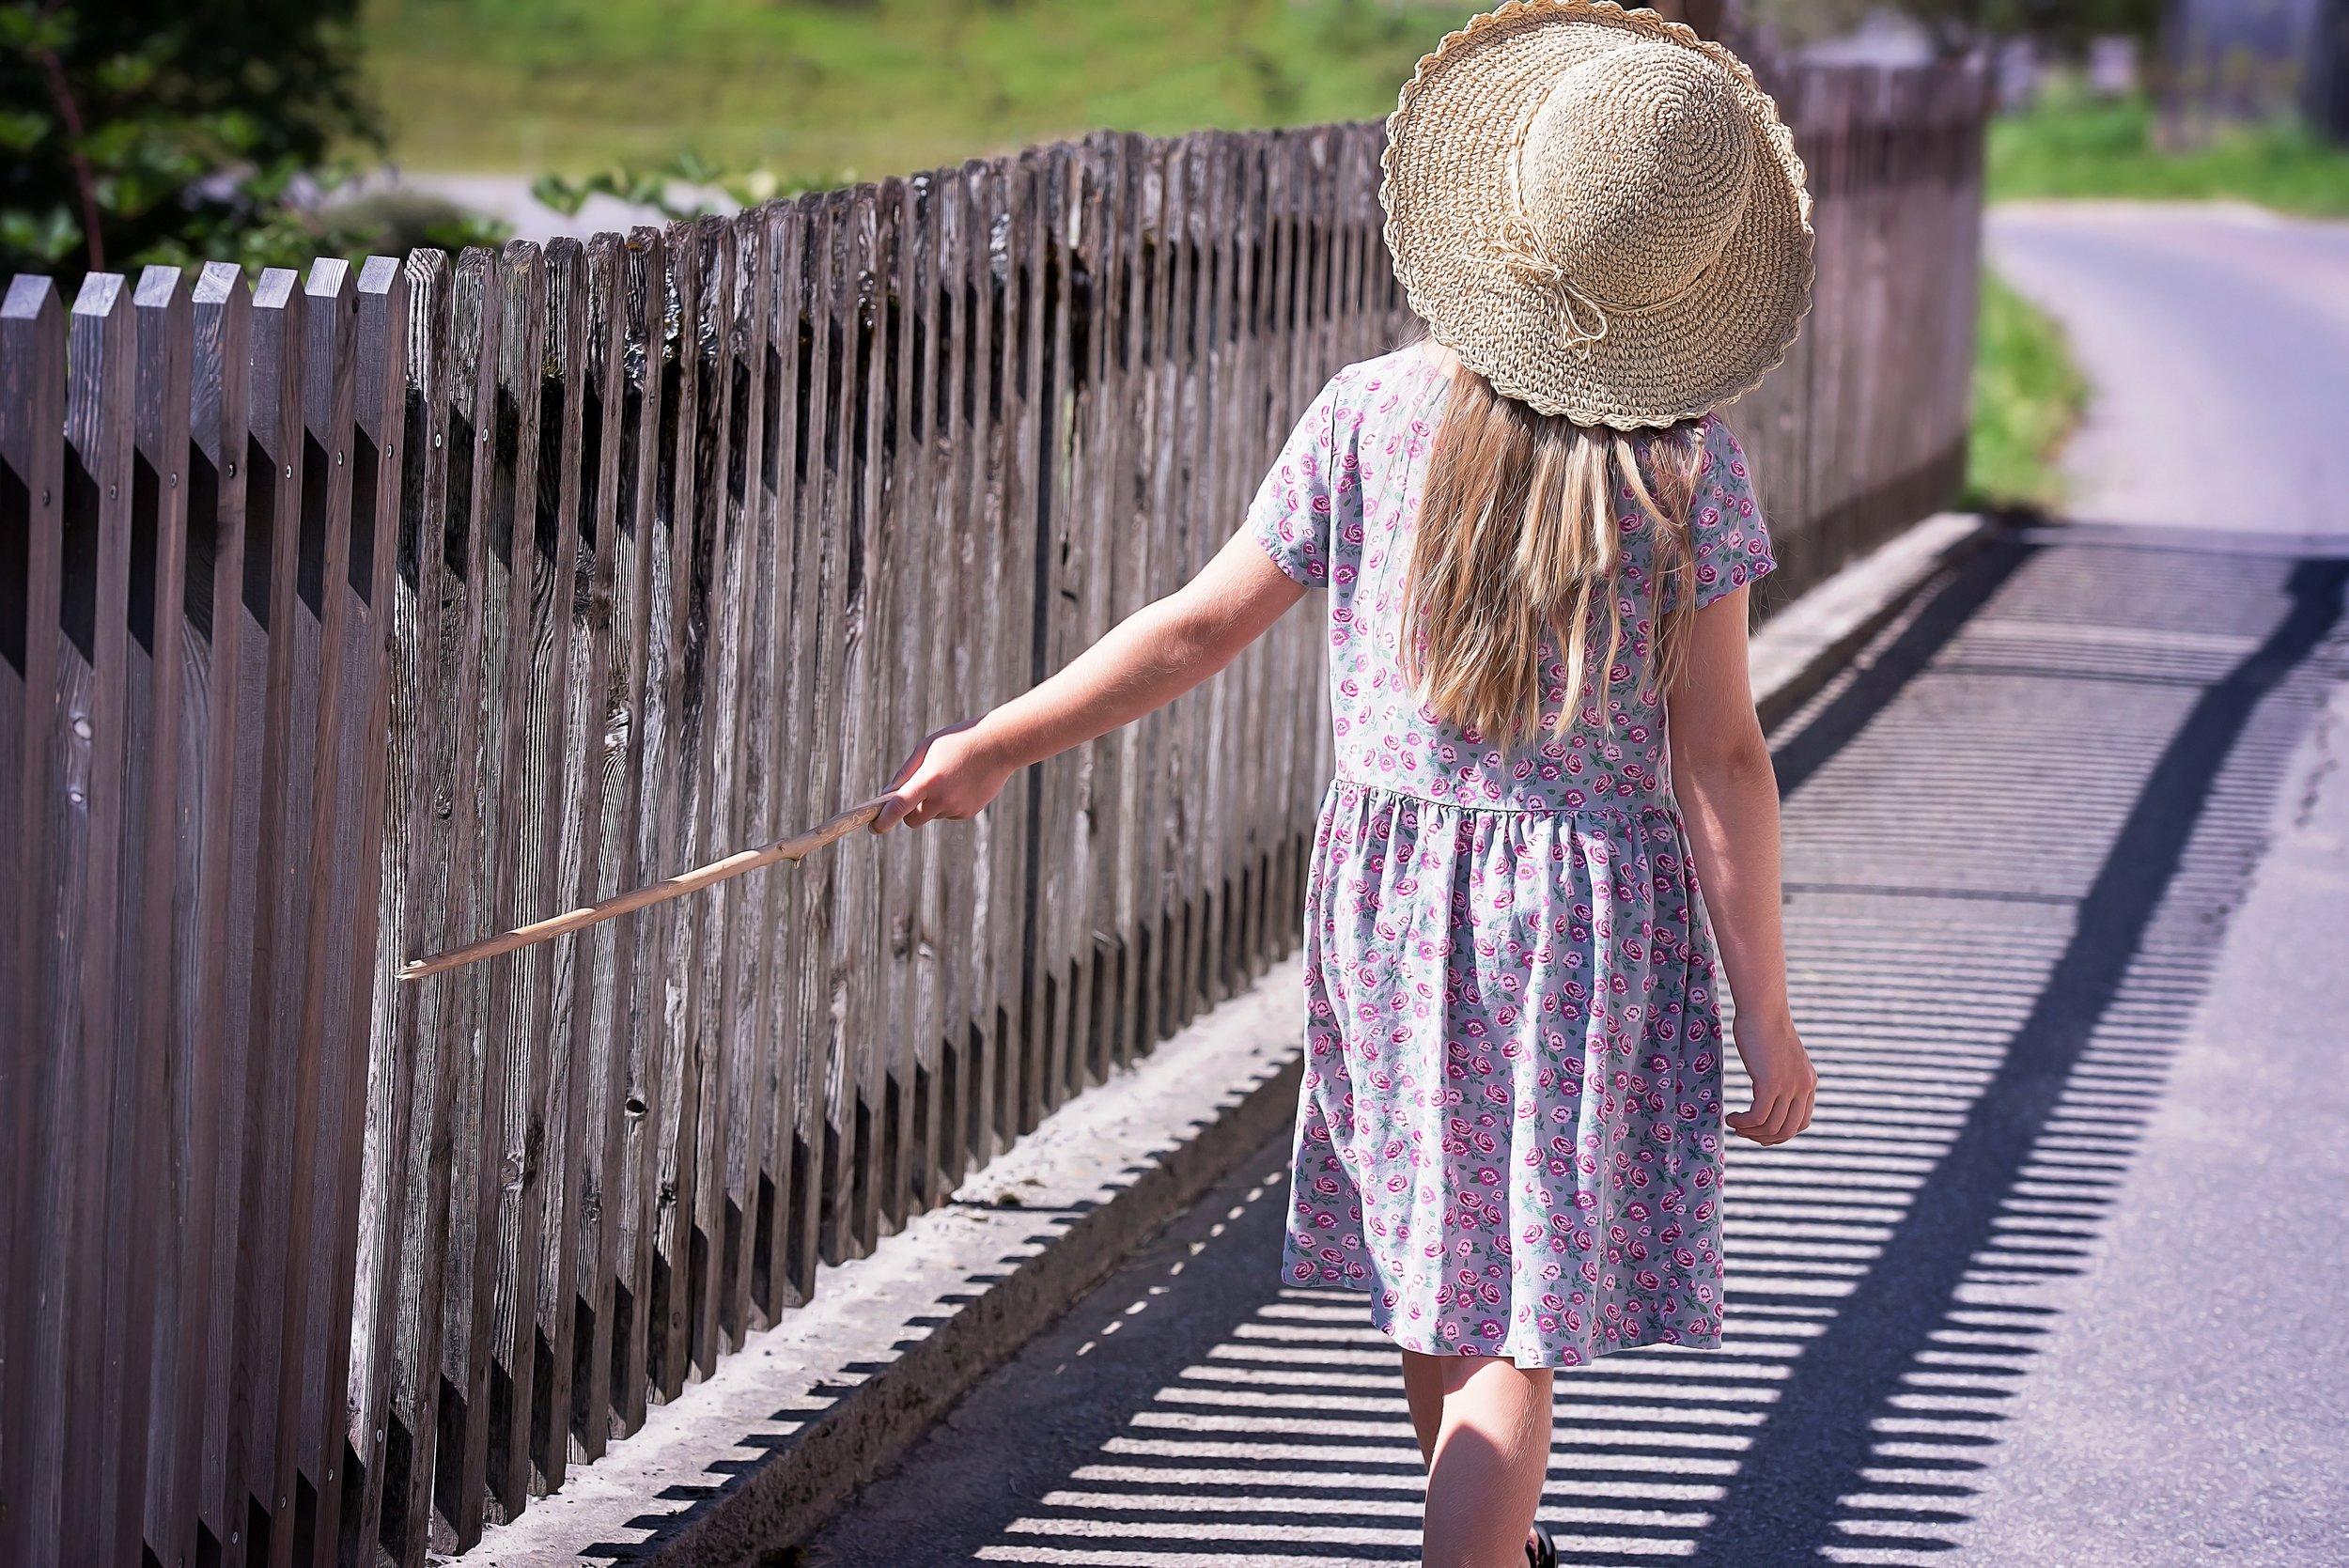 person-human-child-girl (1).jpg